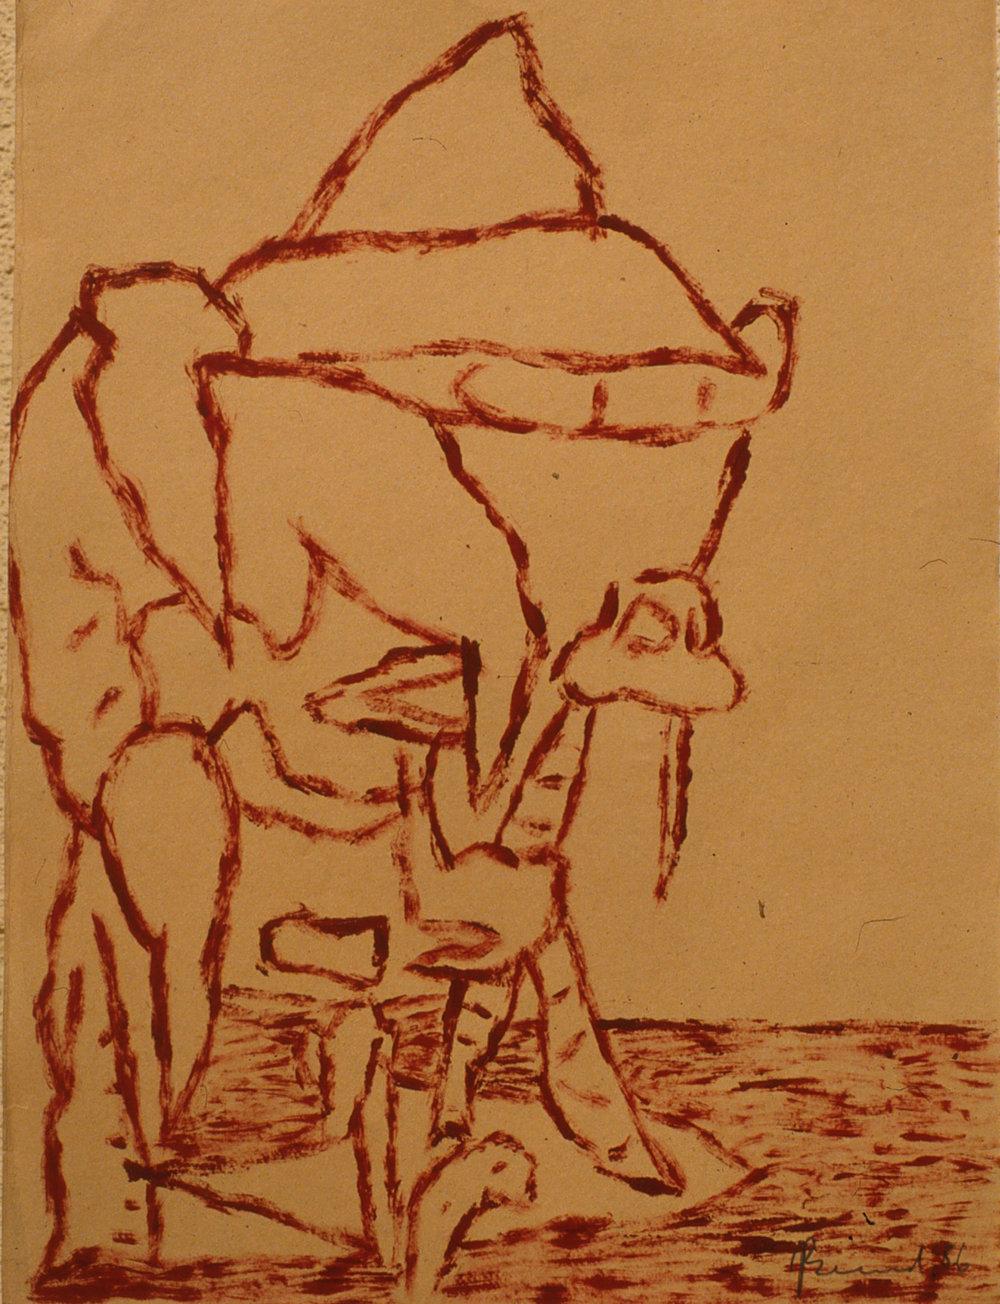 Camel, 1986